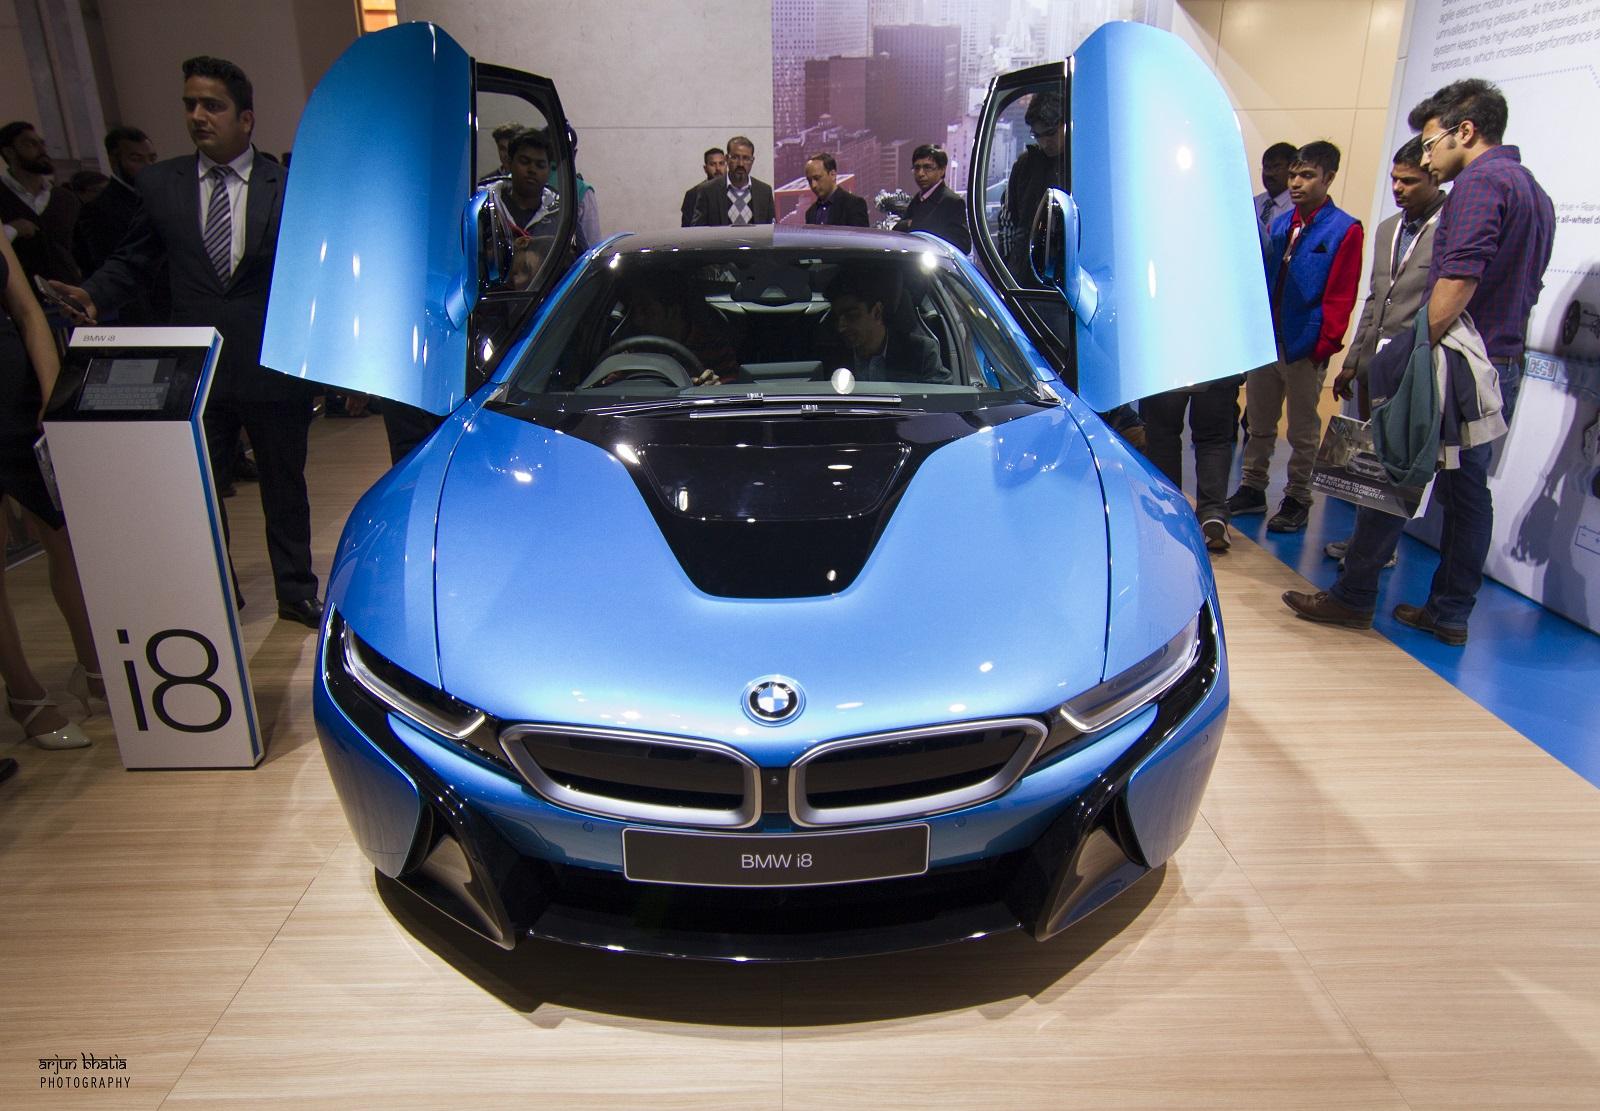 BMW I8 Delhi Auto Expo 2016 1